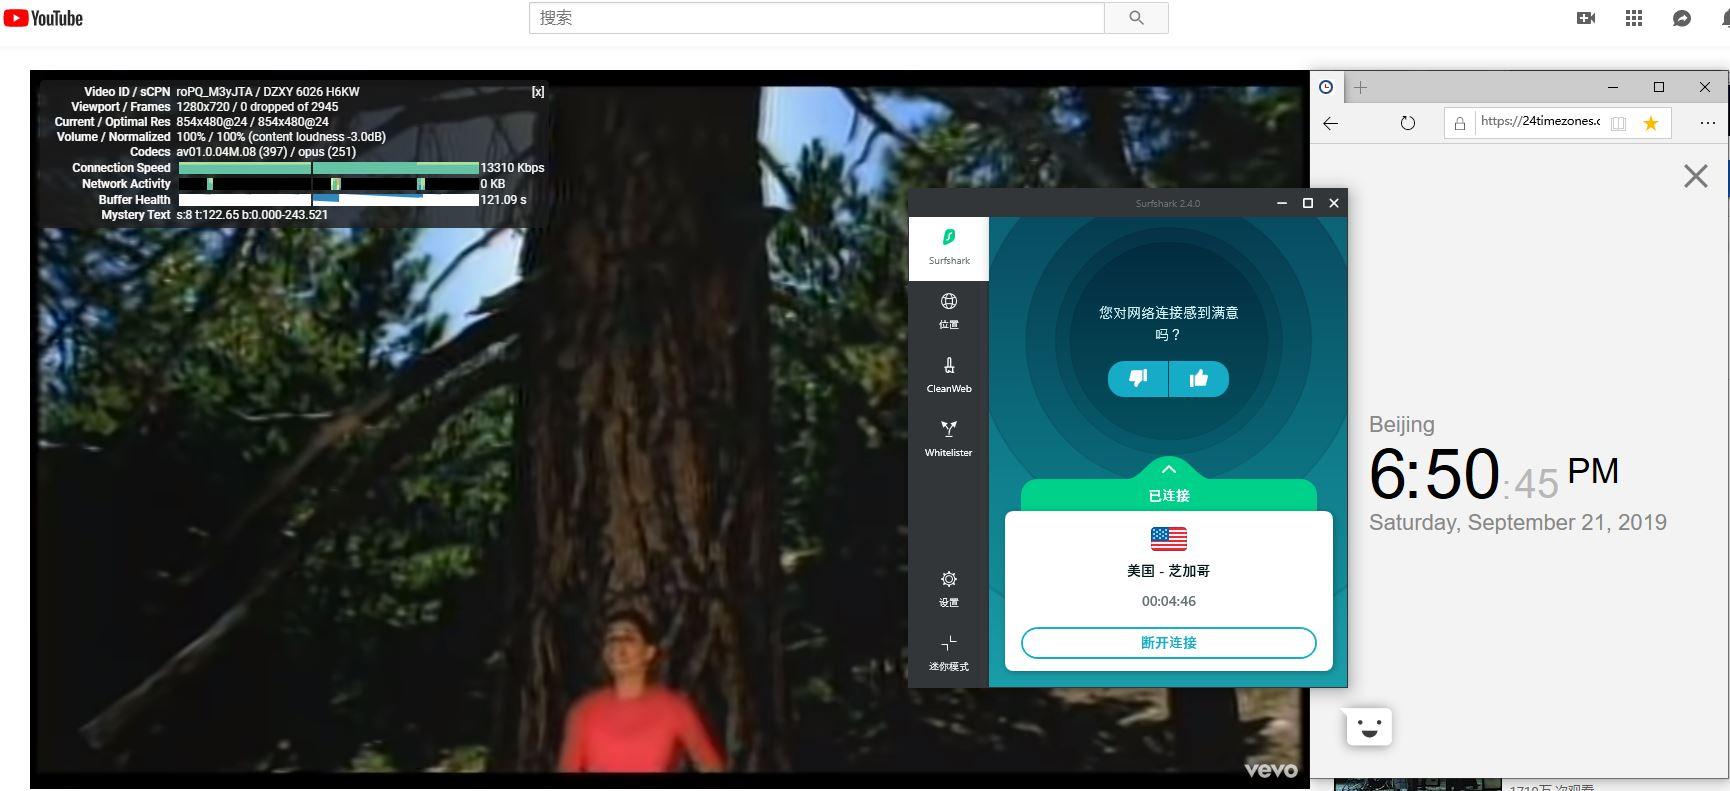 windows SurfsharkVPN 美国 芝加哥 中国VPN翻墙 科学上网 YouTube测速-20190921